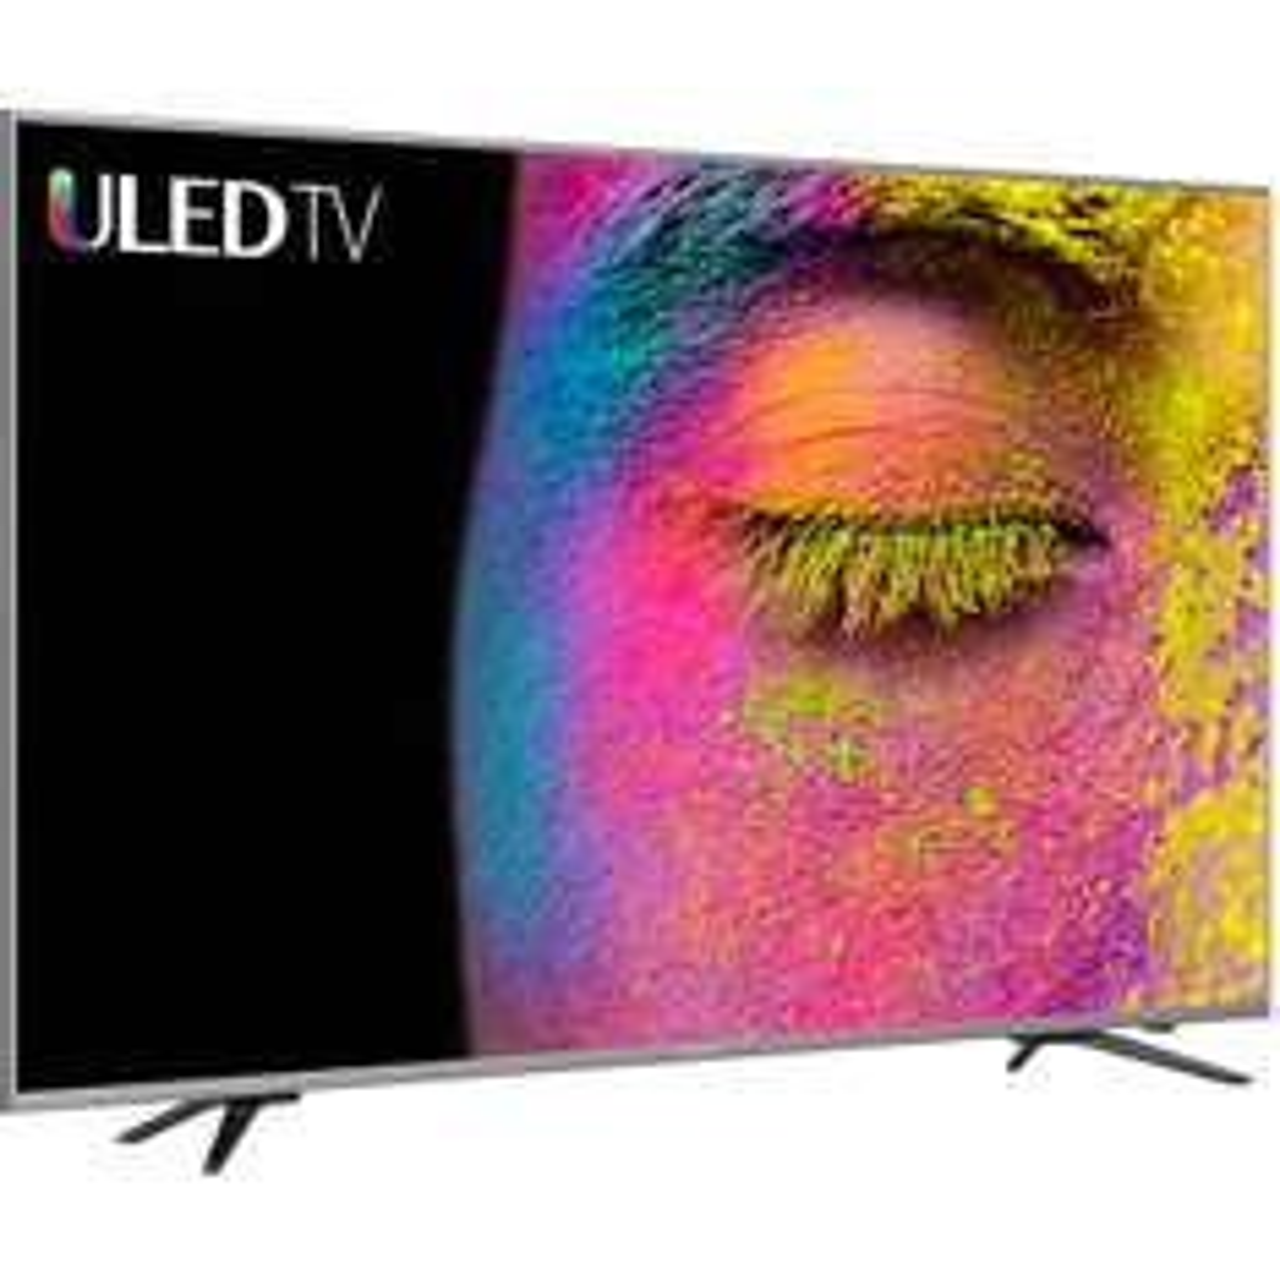 "Hisense H55N6800 55"" Smart 4K Ultra HD with HDR TV £609 @ ao.com"